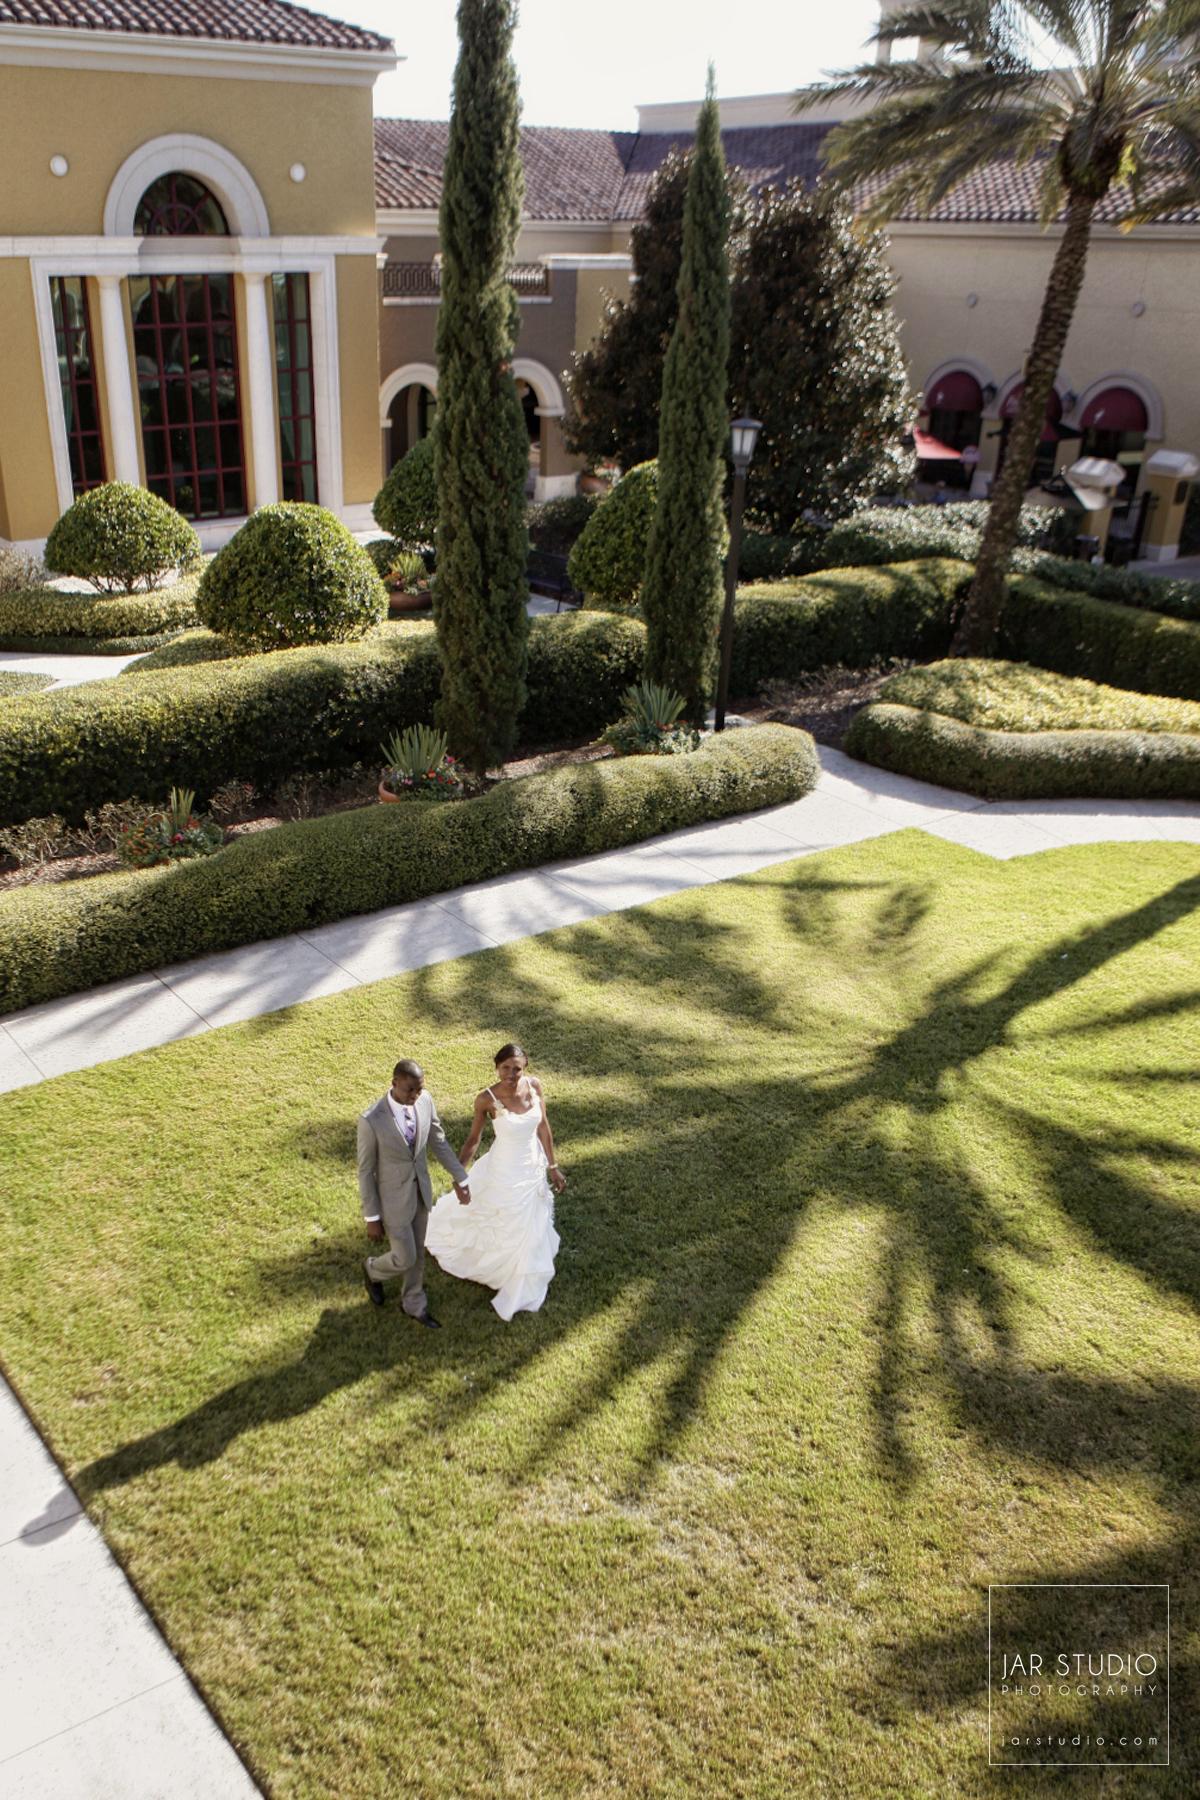 39-Wedding-Hilton-Grand-Vacations -Tuscany-Village-Photographer-jarstudio.JPG